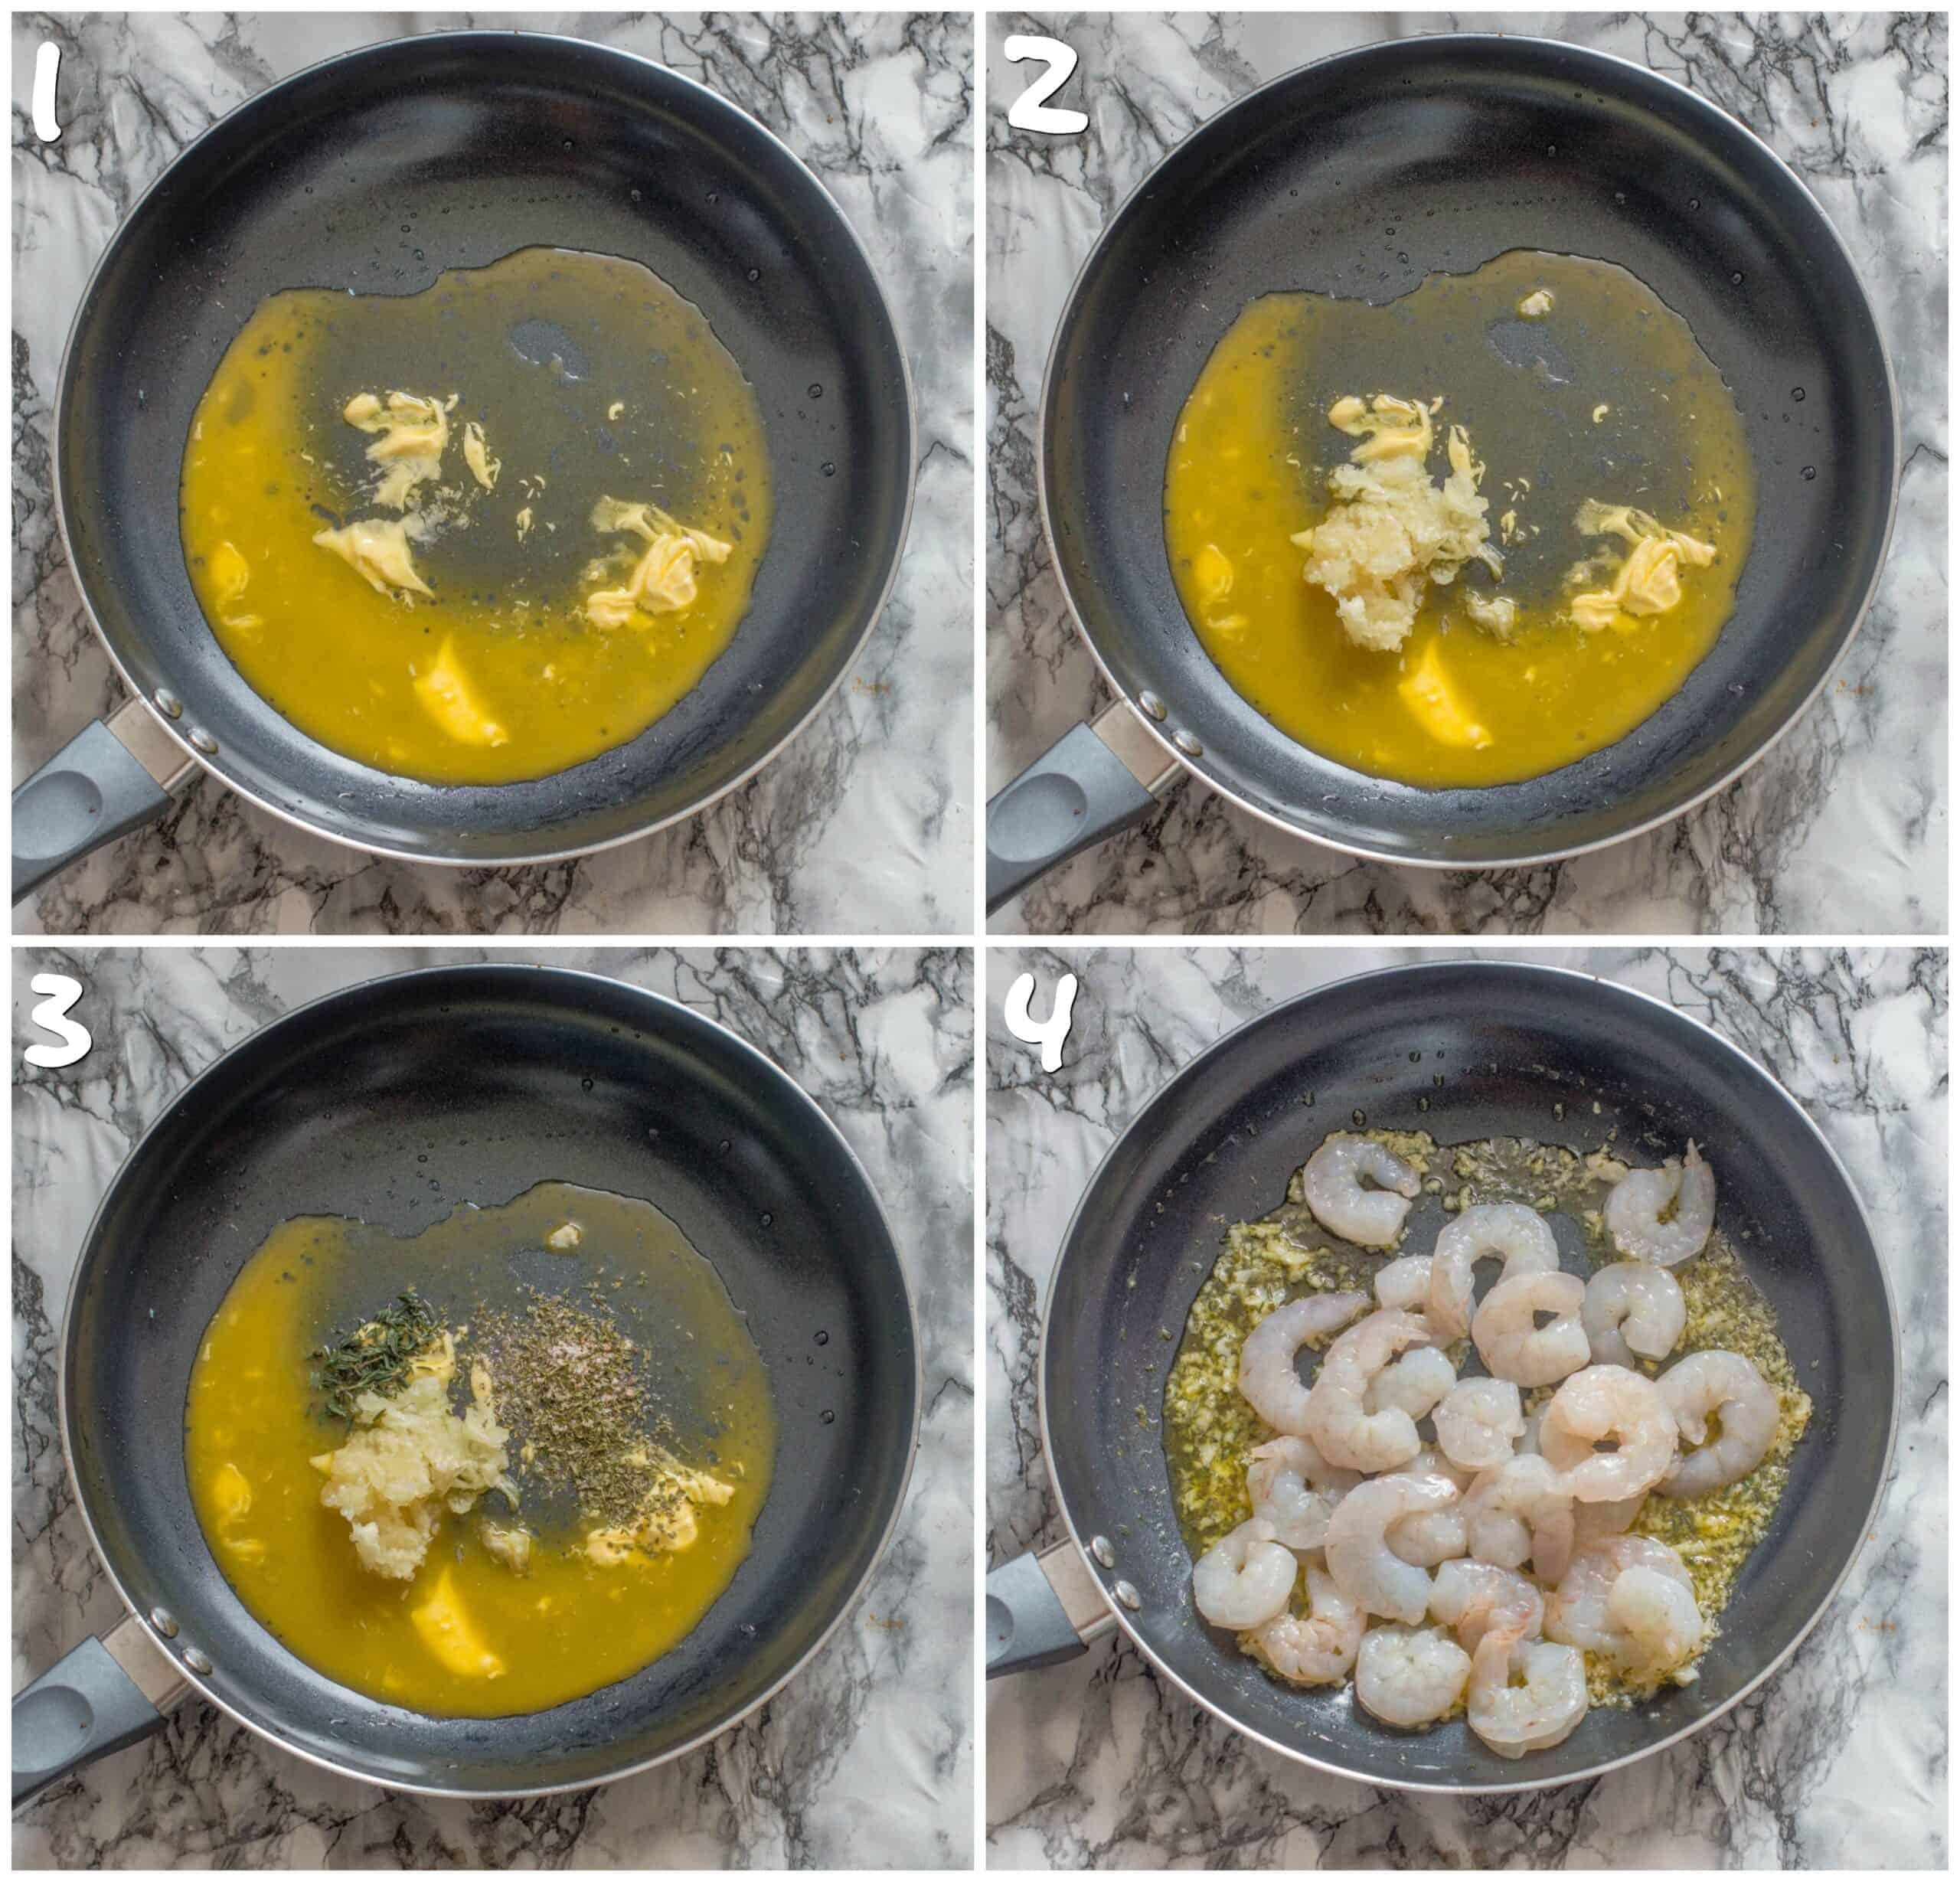 steps 1-4 pan frying the shrimp in butter